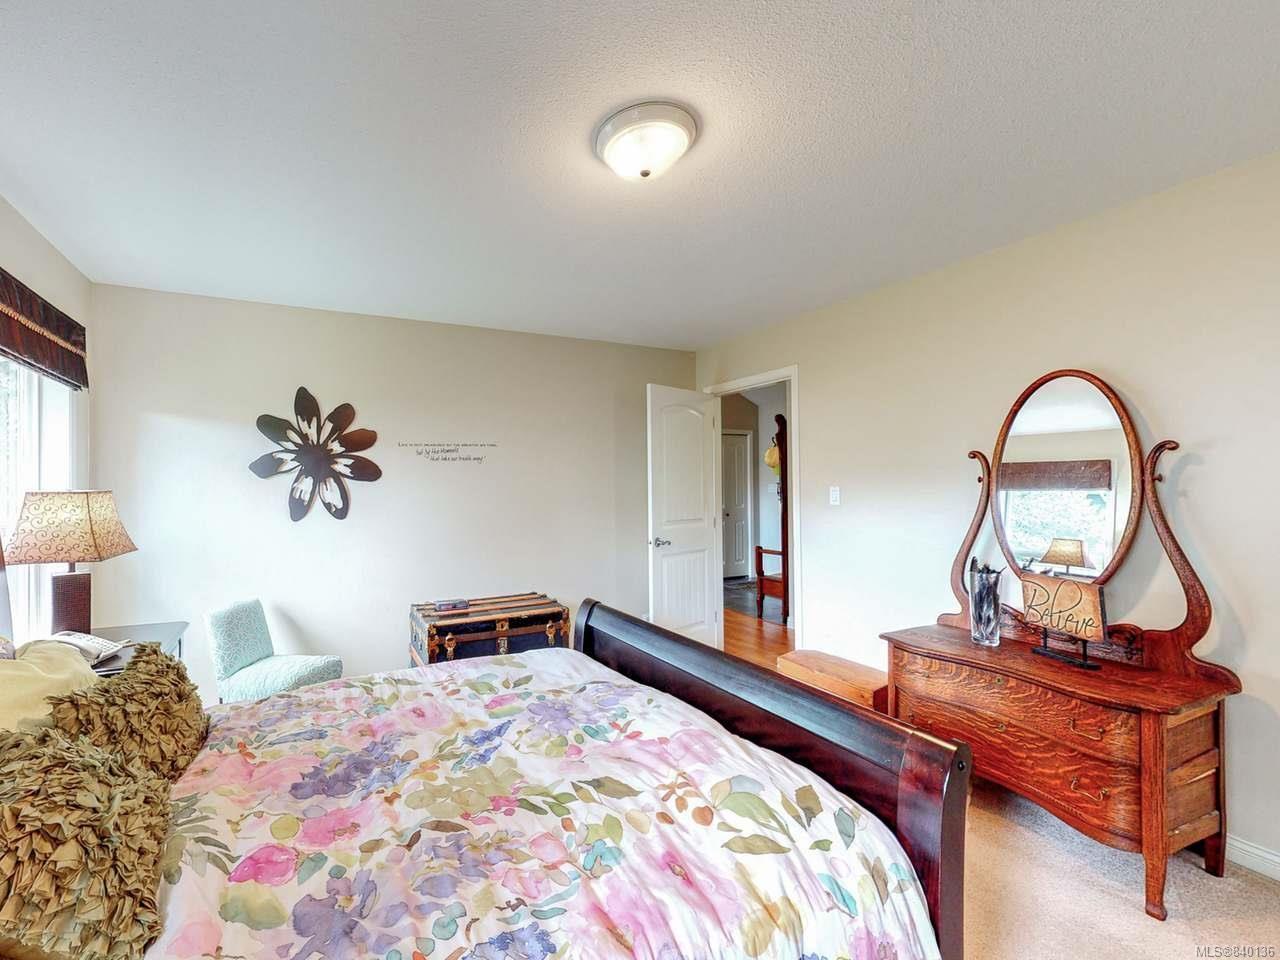 Photo 18: Photos: 5484 W Woodland Cres in PORT ALBERNI: PA Port Alberni House for sale (Port Alberni)  : MLS®# 840136